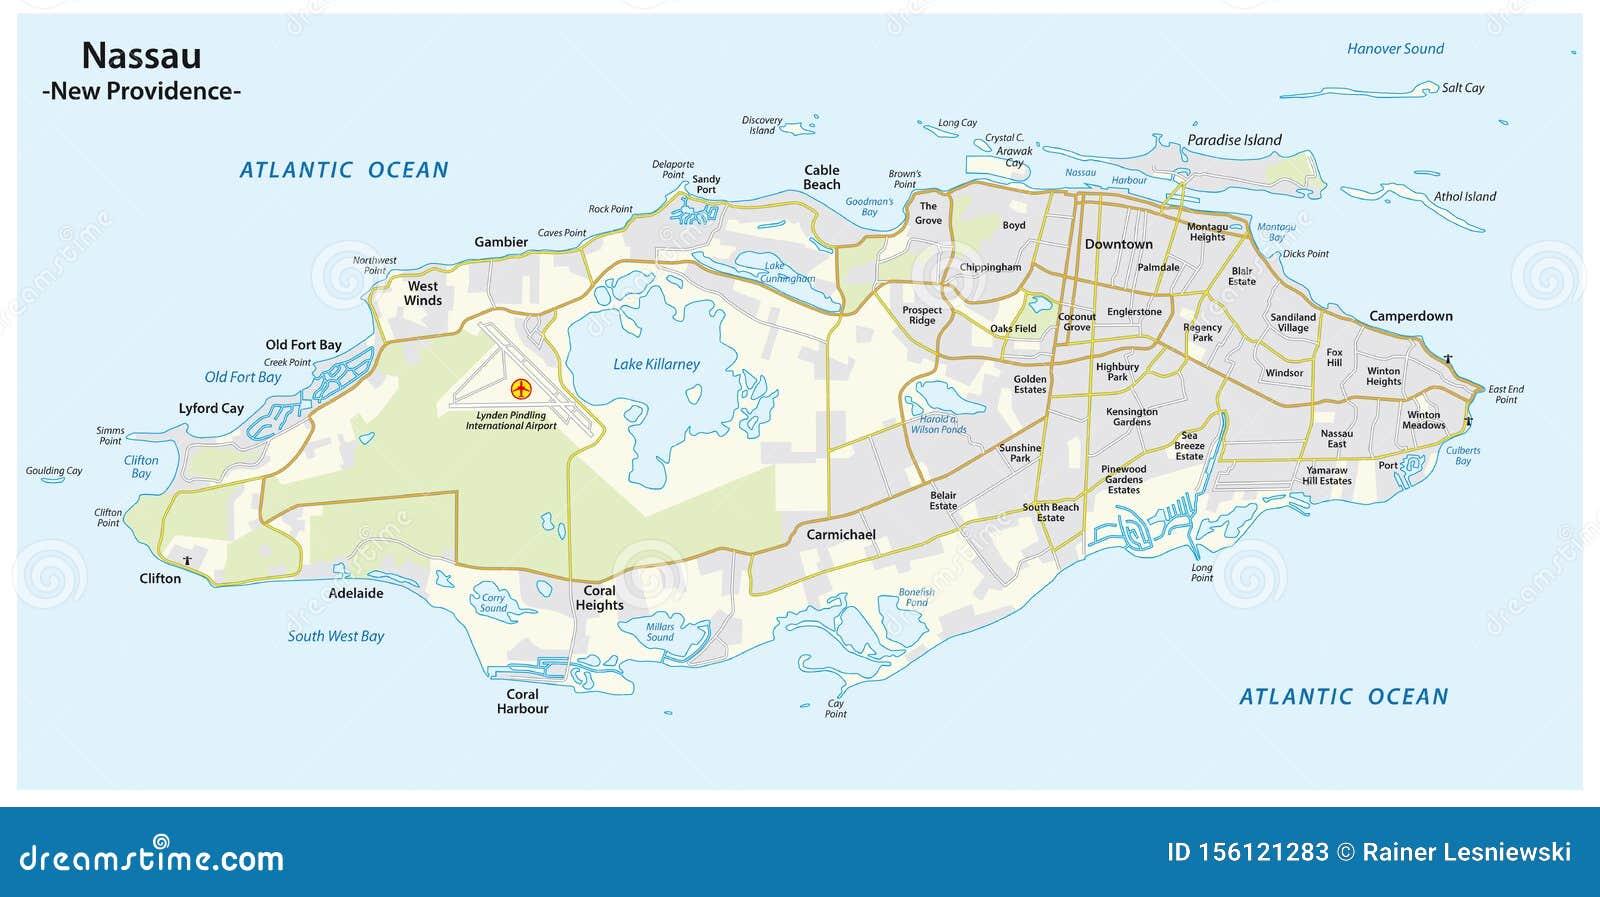 printable map of nassau bahamas Map Of Nassau Capital Of The Bahamas On The Island Of New printable map of nassau bahamas